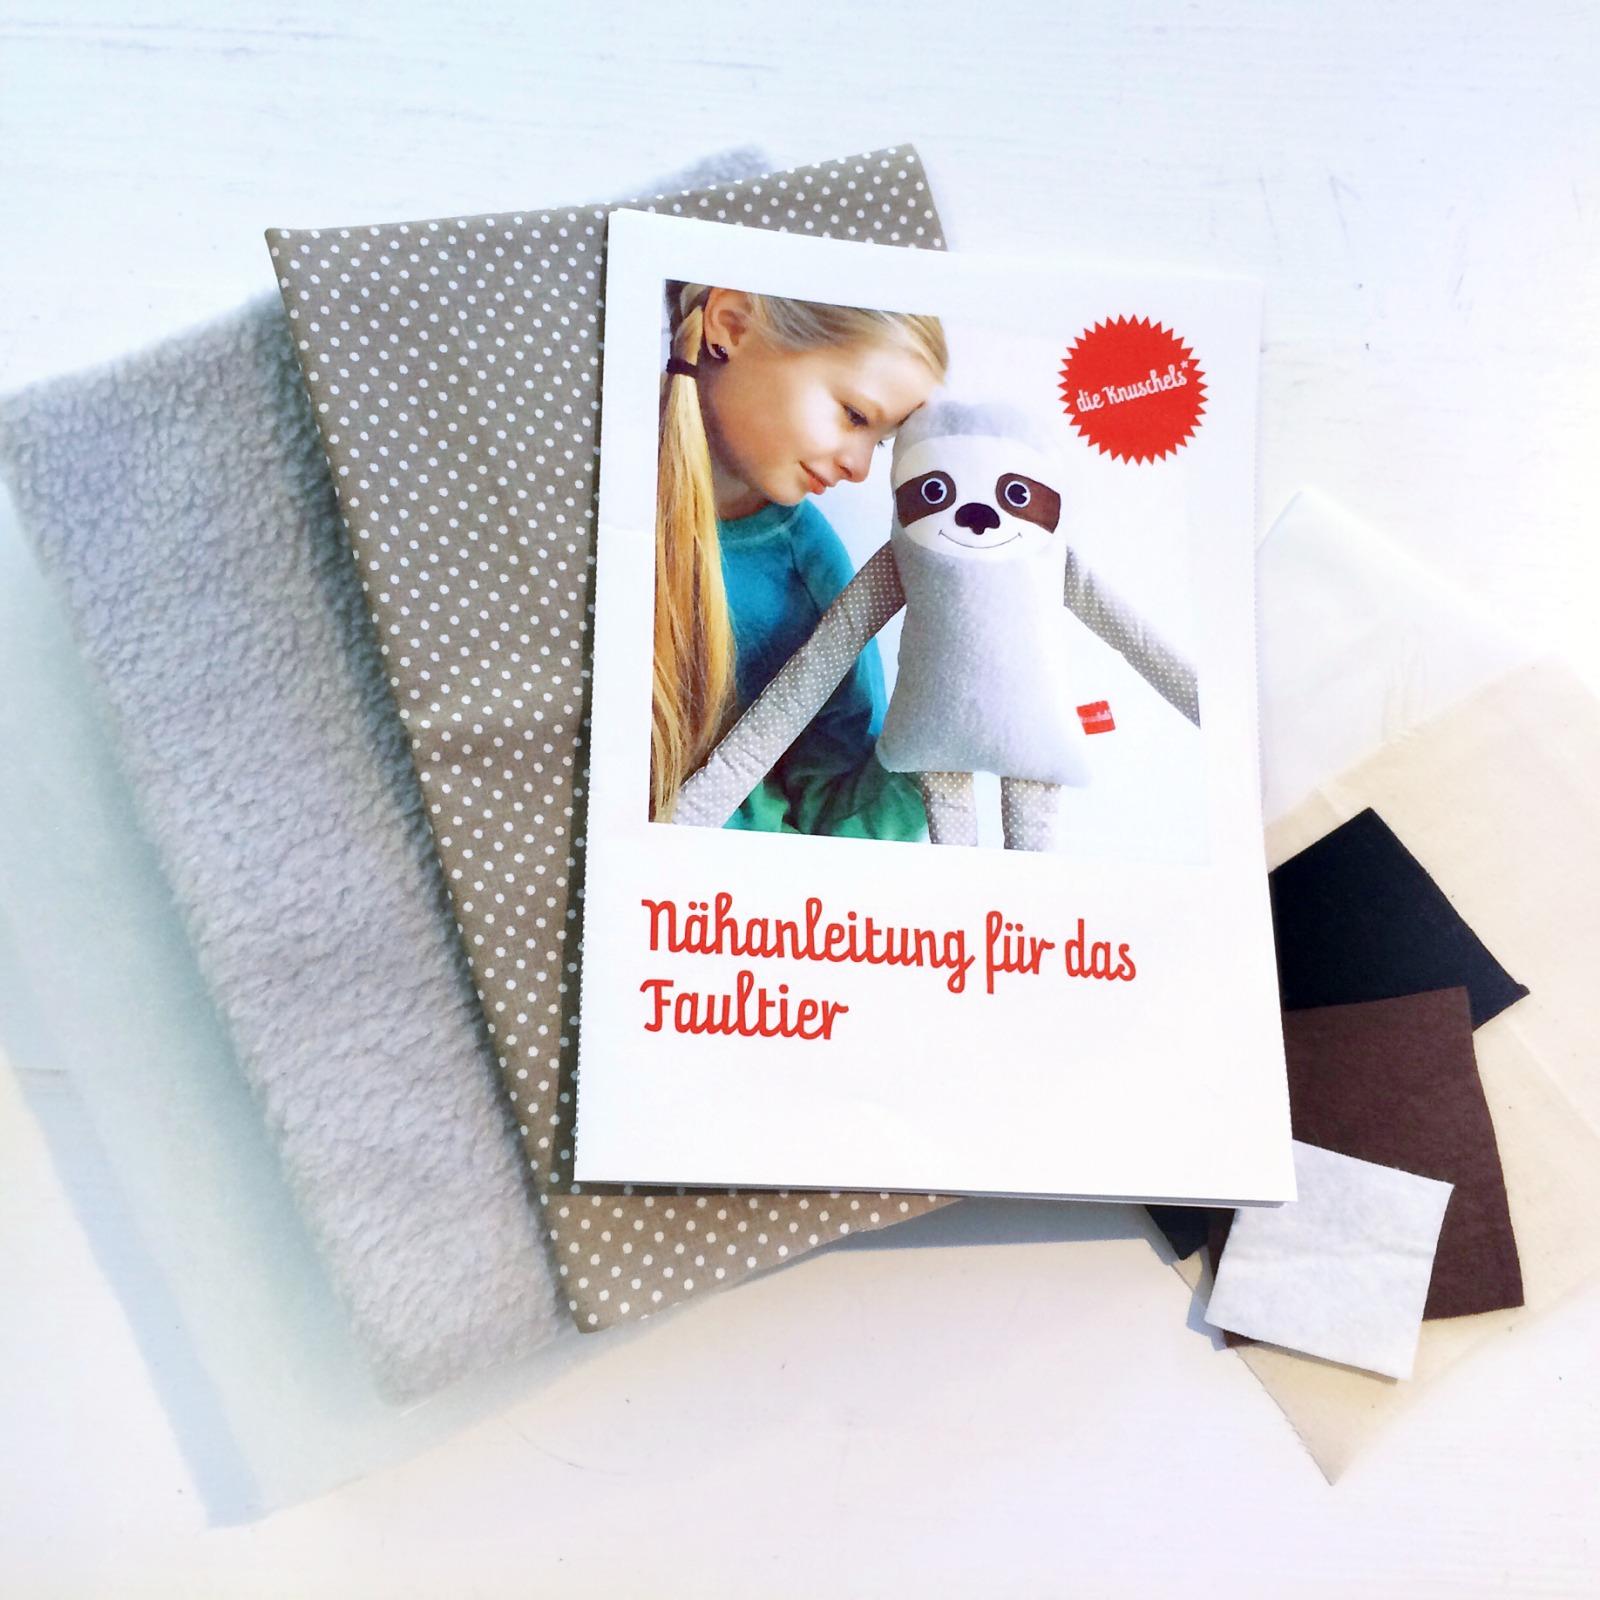 Faultiernähpaket Anleitung Material  Schnitt für das Faultier von Knuschels